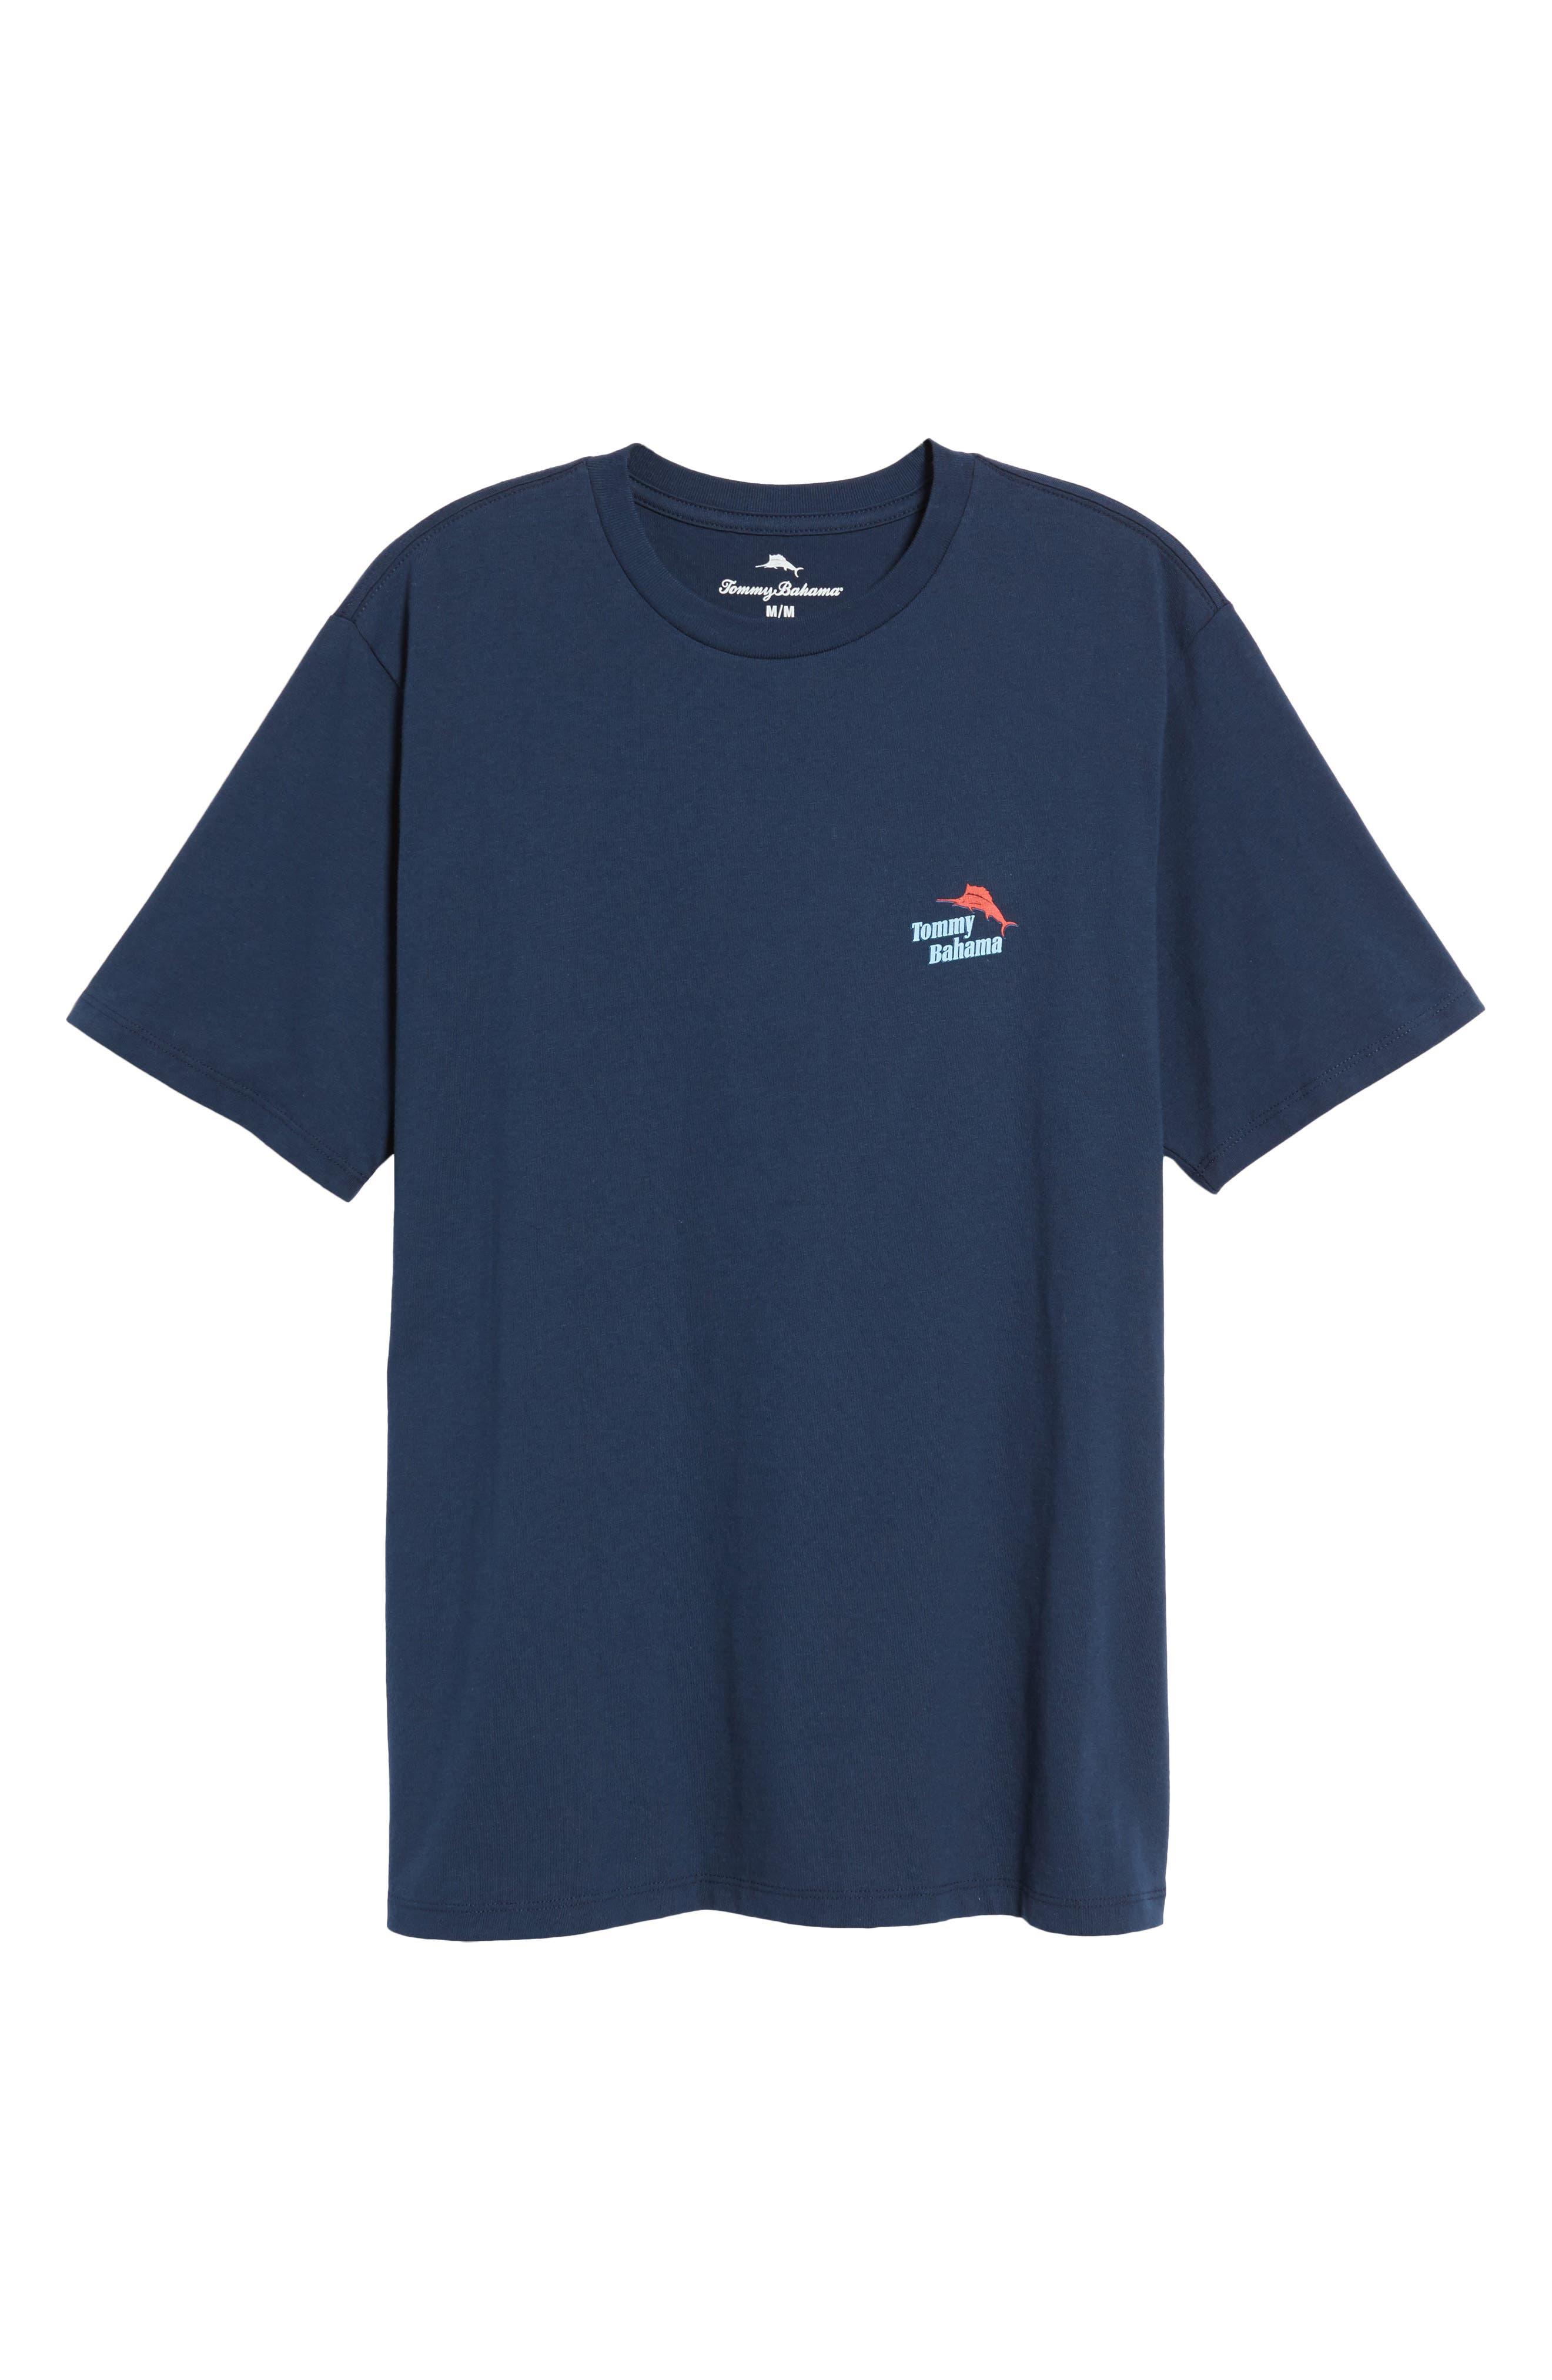 Parrot Sailing T-Shirt,                             Alternate thumbnail 6, color,                             400